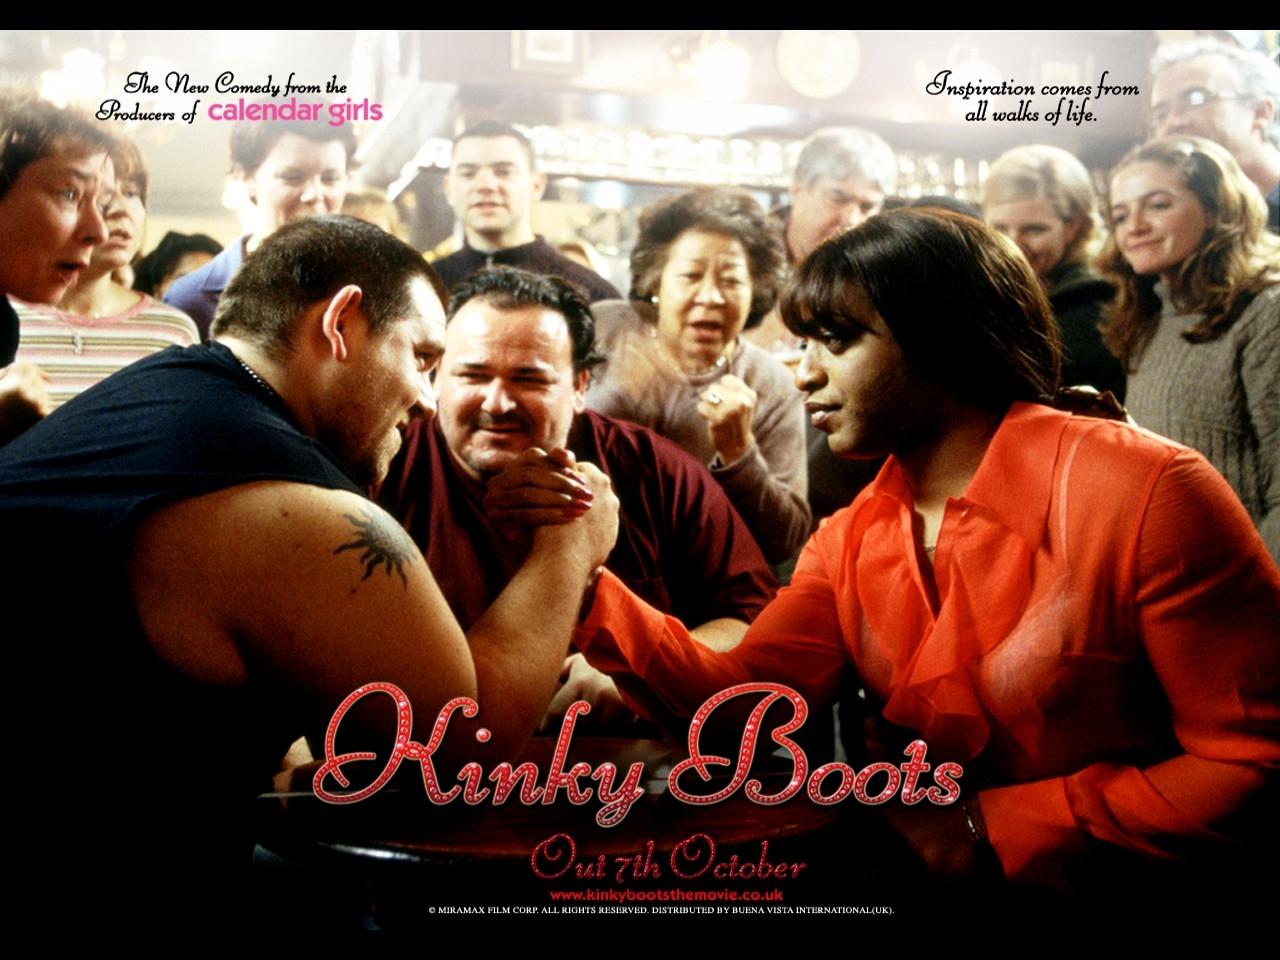 Wallpaper del film kinky boots decisamente diversi del 2005 62536 - Kinky boots decisamente diversi ...